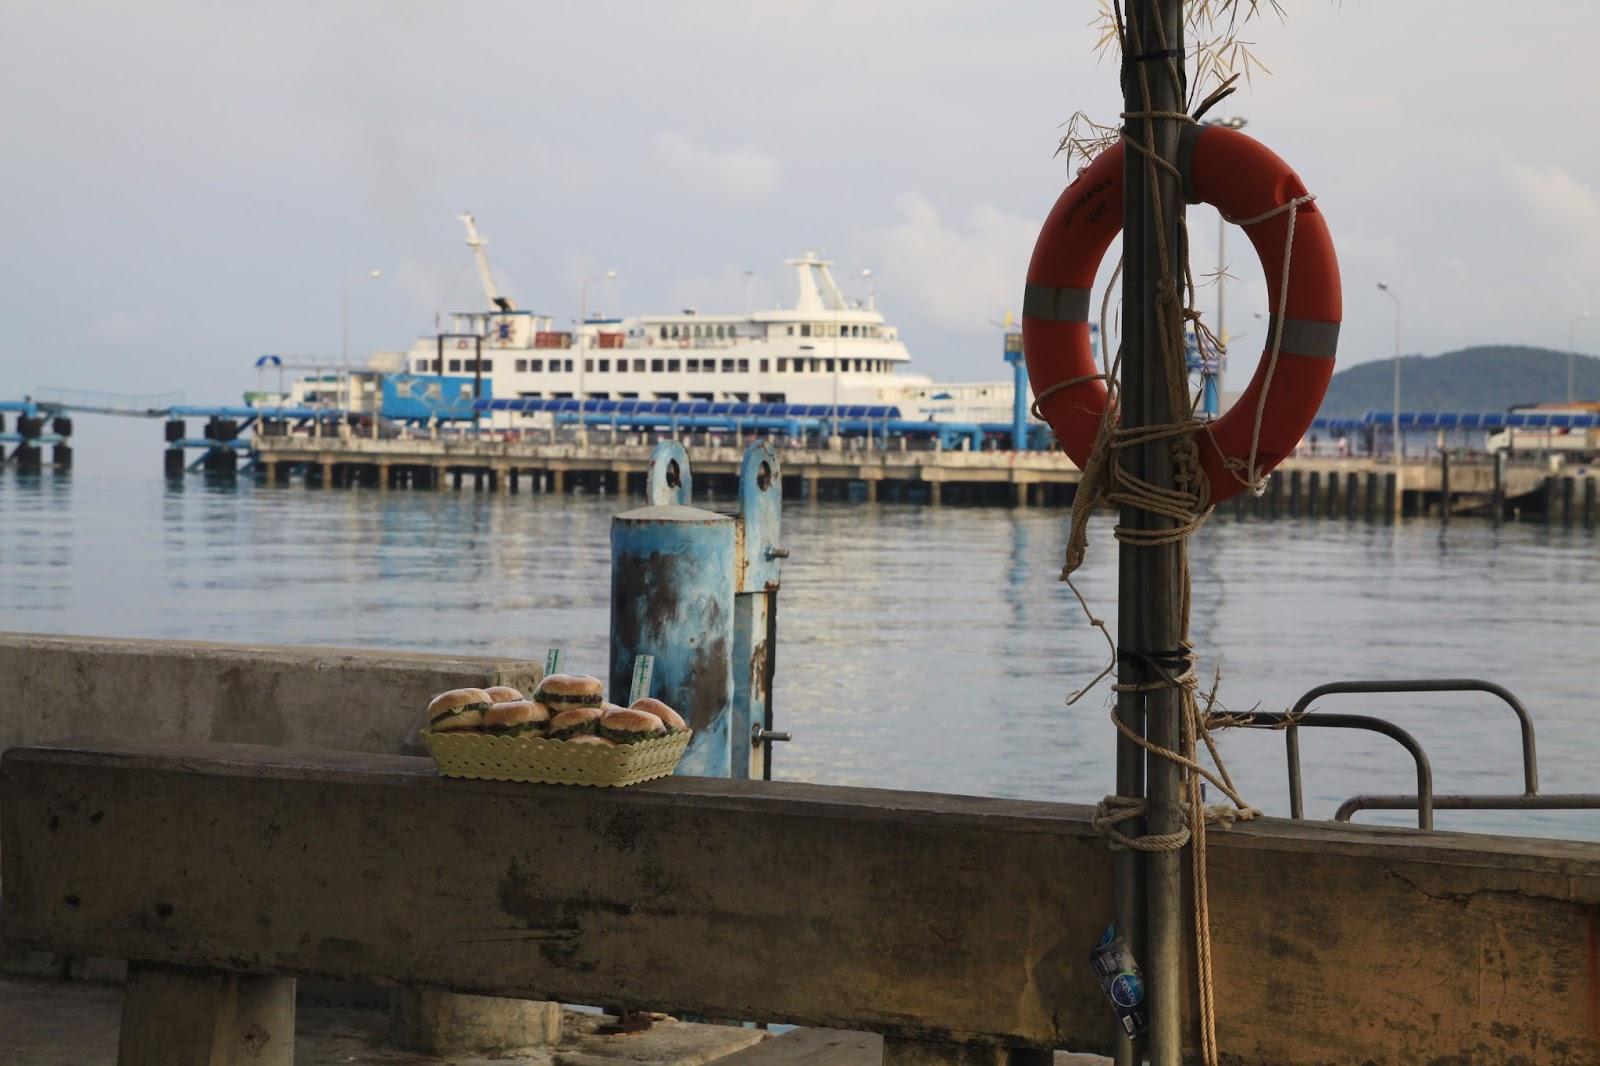 Surat Thani Ferry, Koh Samui Ferry